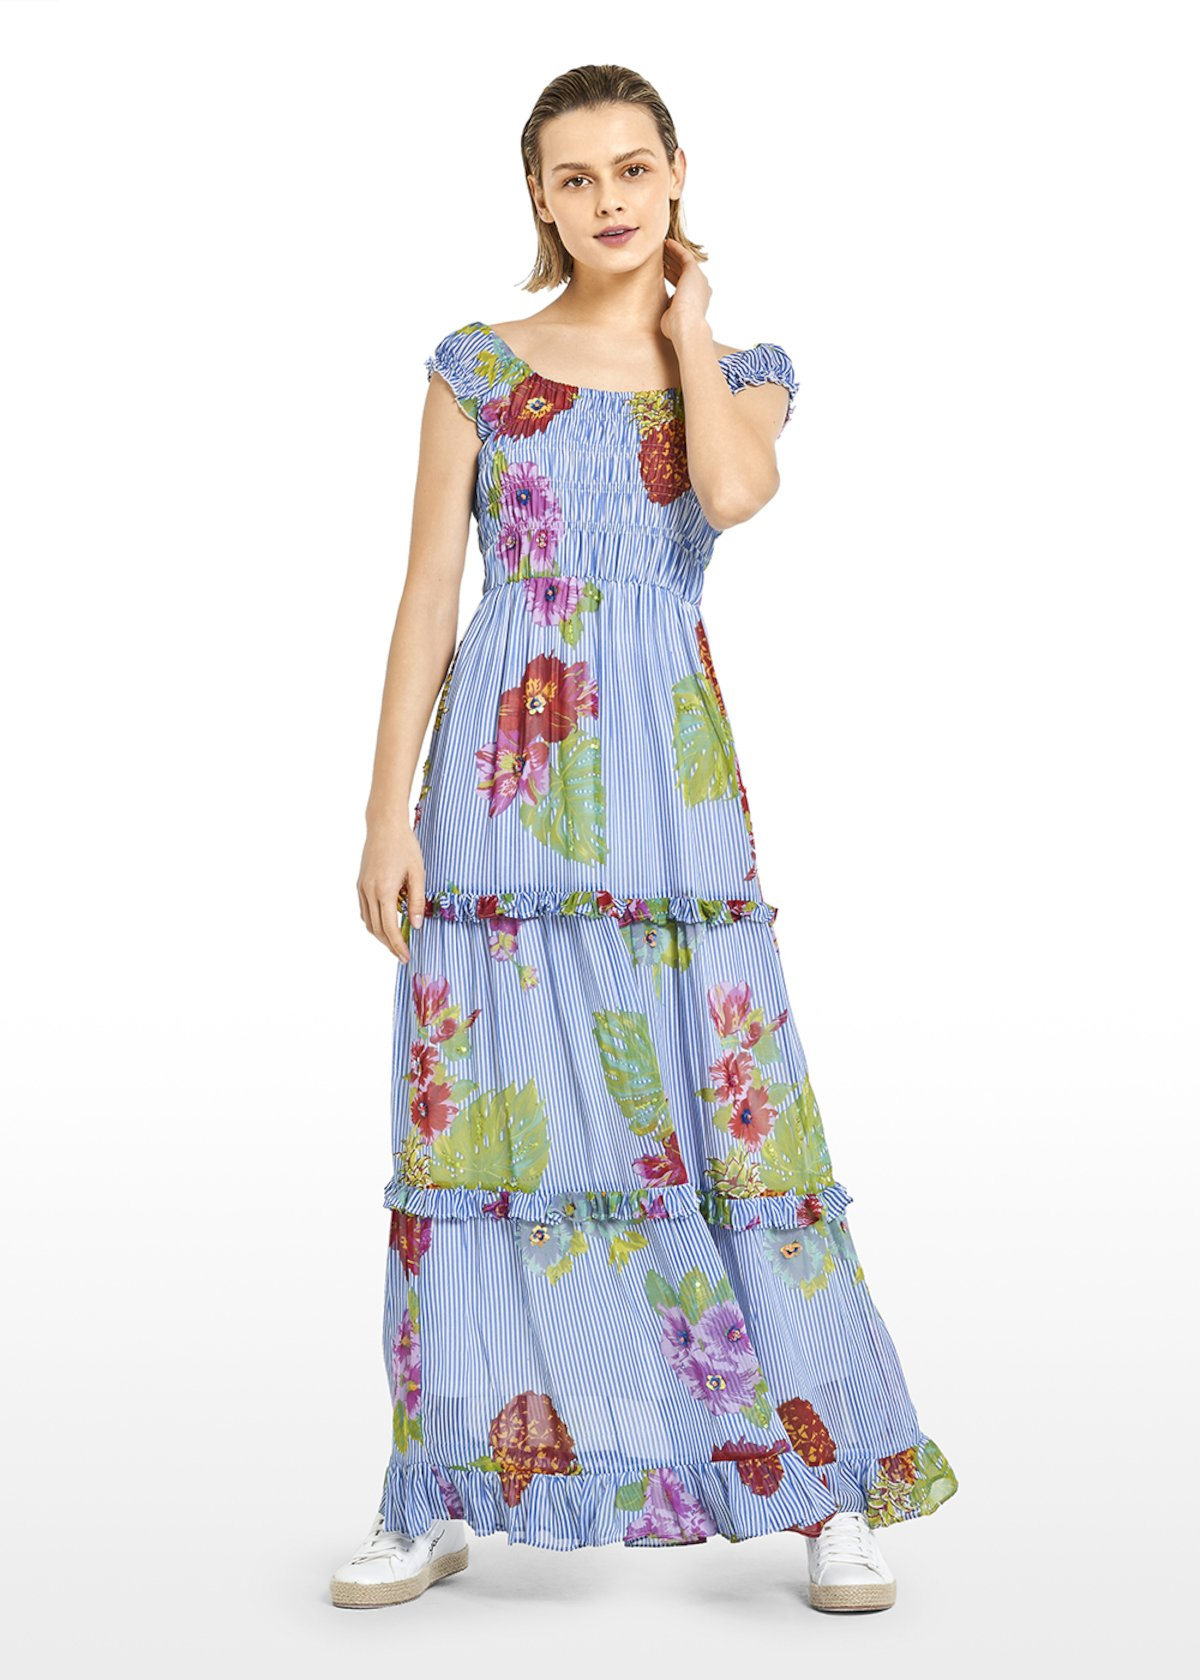 Long Akym georgette dress with Hawaiian flowers motif - Avion / White Fantasia - Woman - Category image